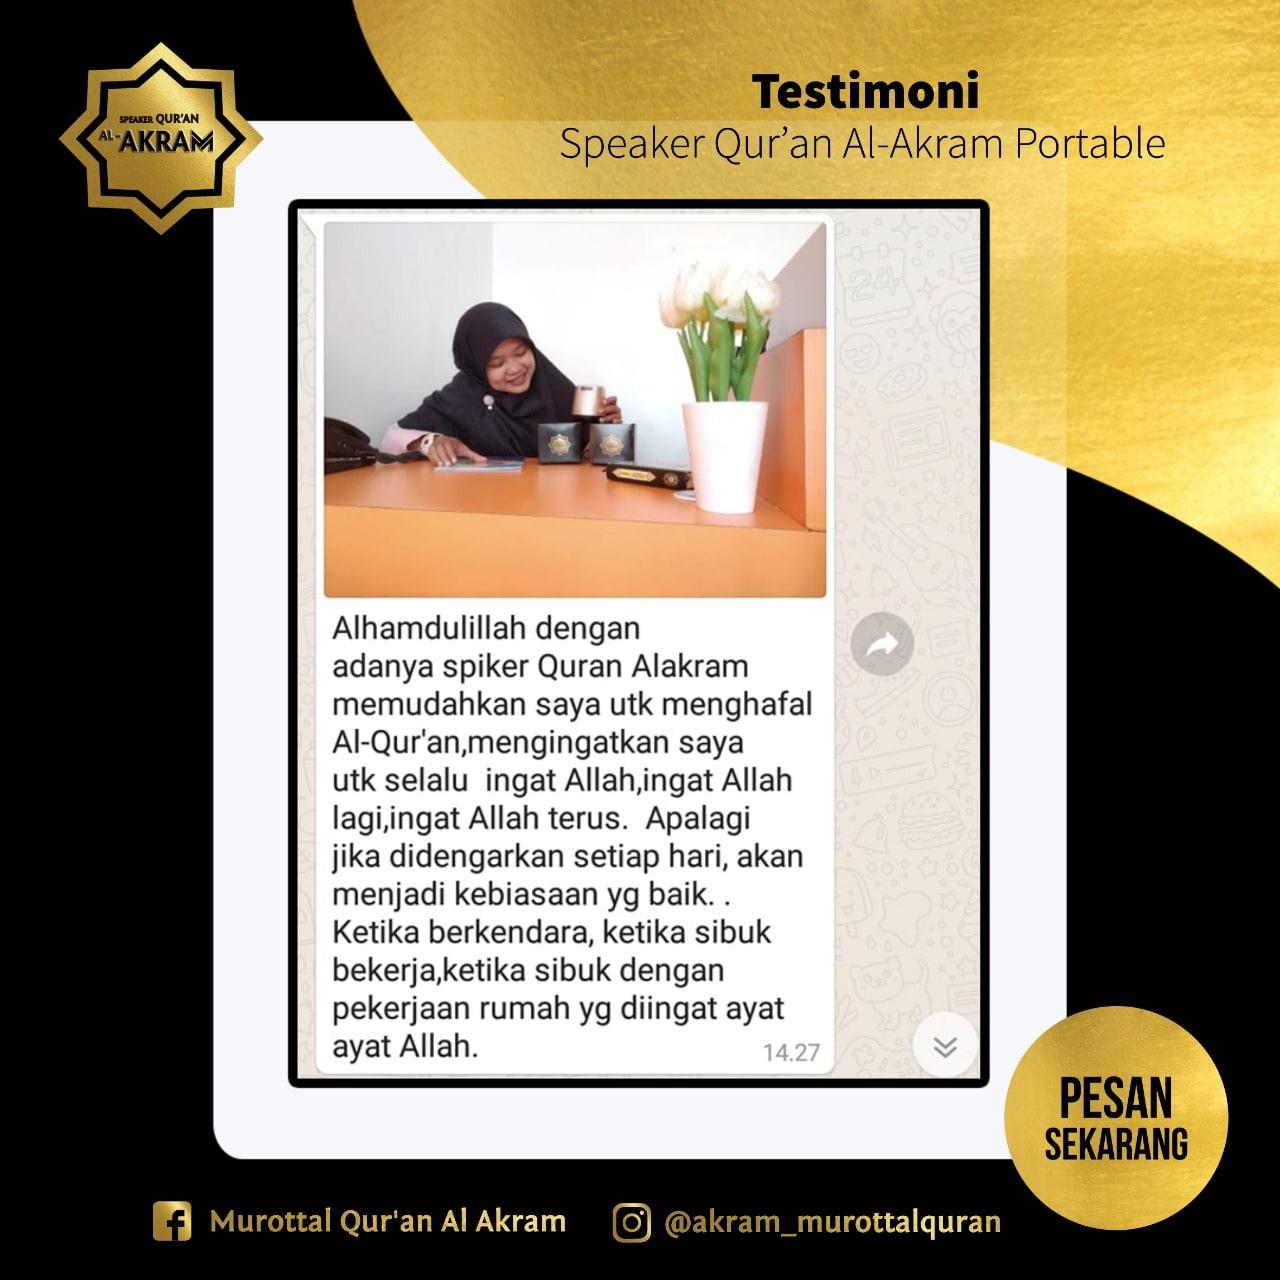 speaker-quran-alakram-testi8